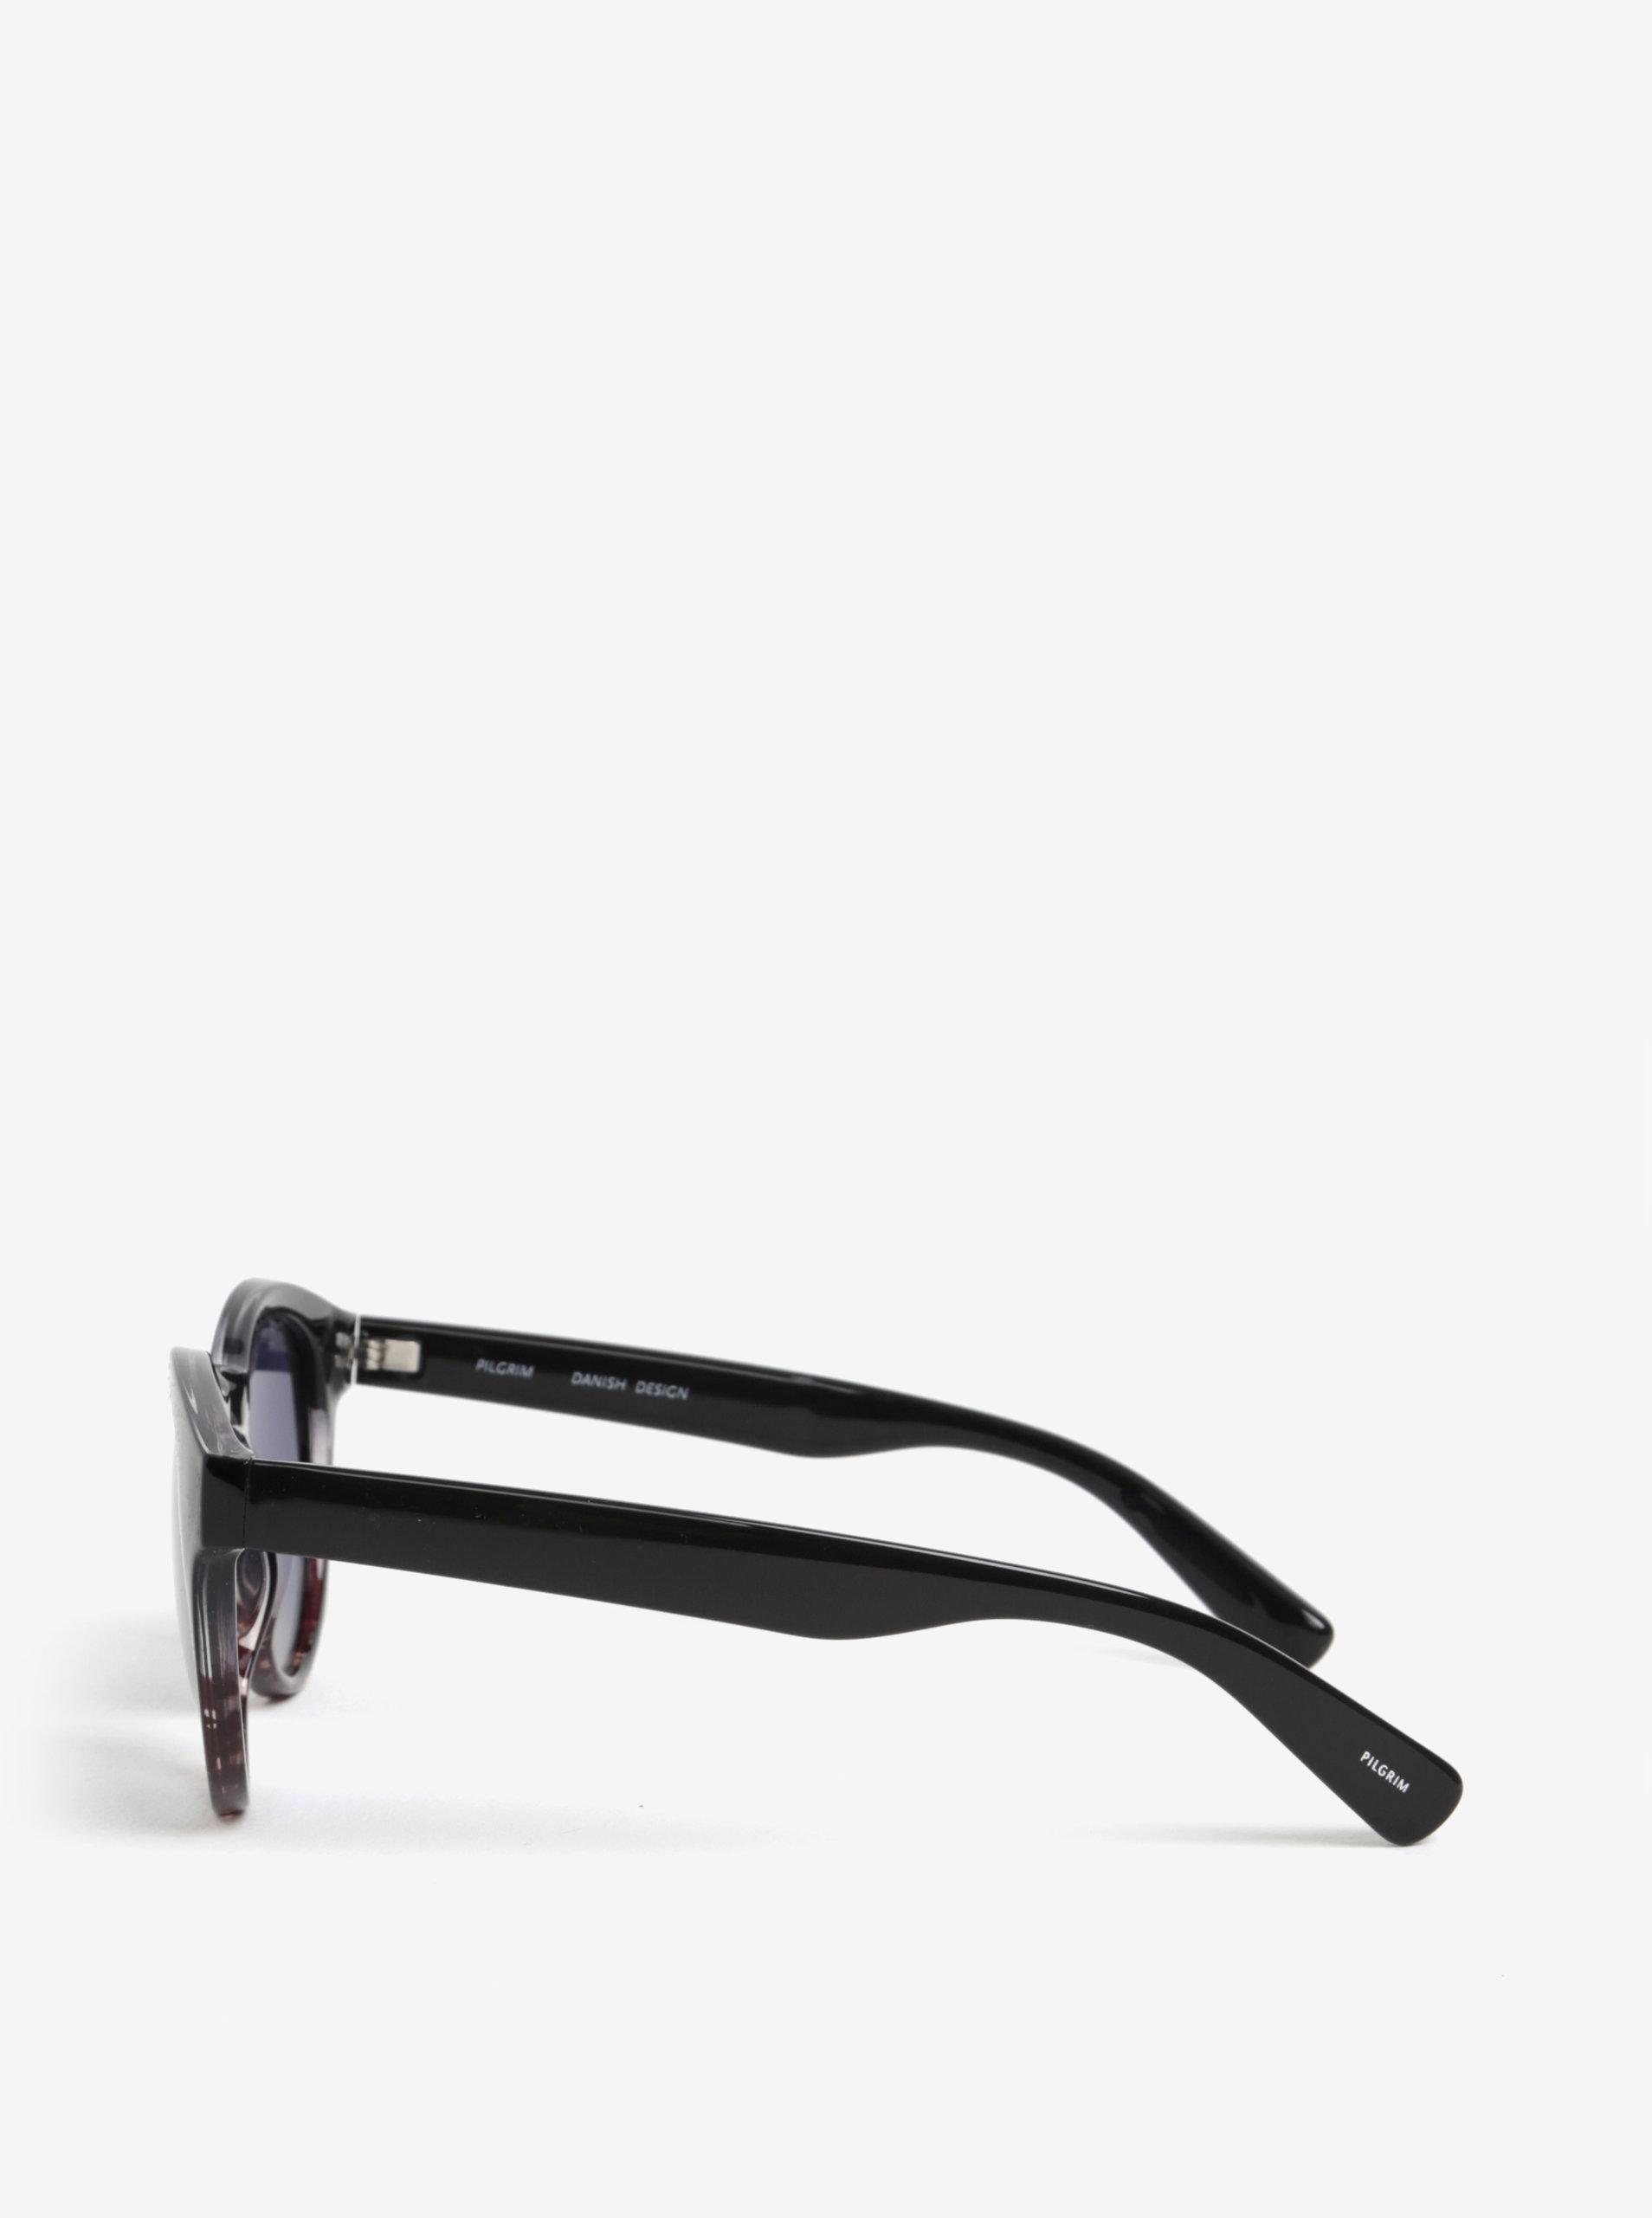 Hnedo-čierne dámske slnečné okuliare Pilgrim Kimana ... 4f869c00c5c